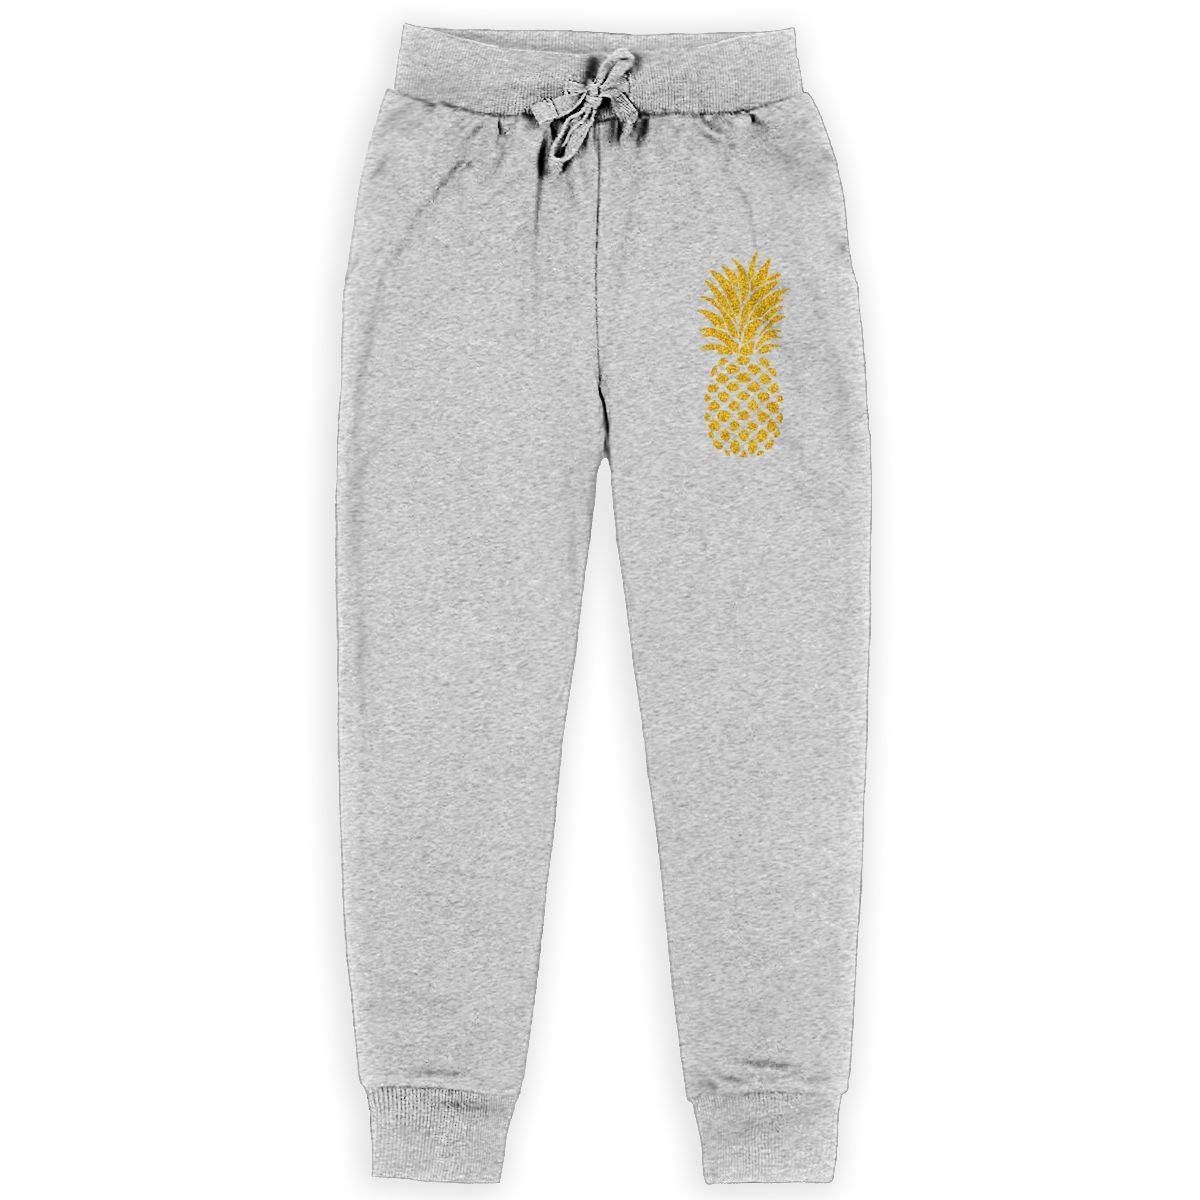 Carrteid Pineapple Printed Boys Fleece Pant Jogger Fleece Pants